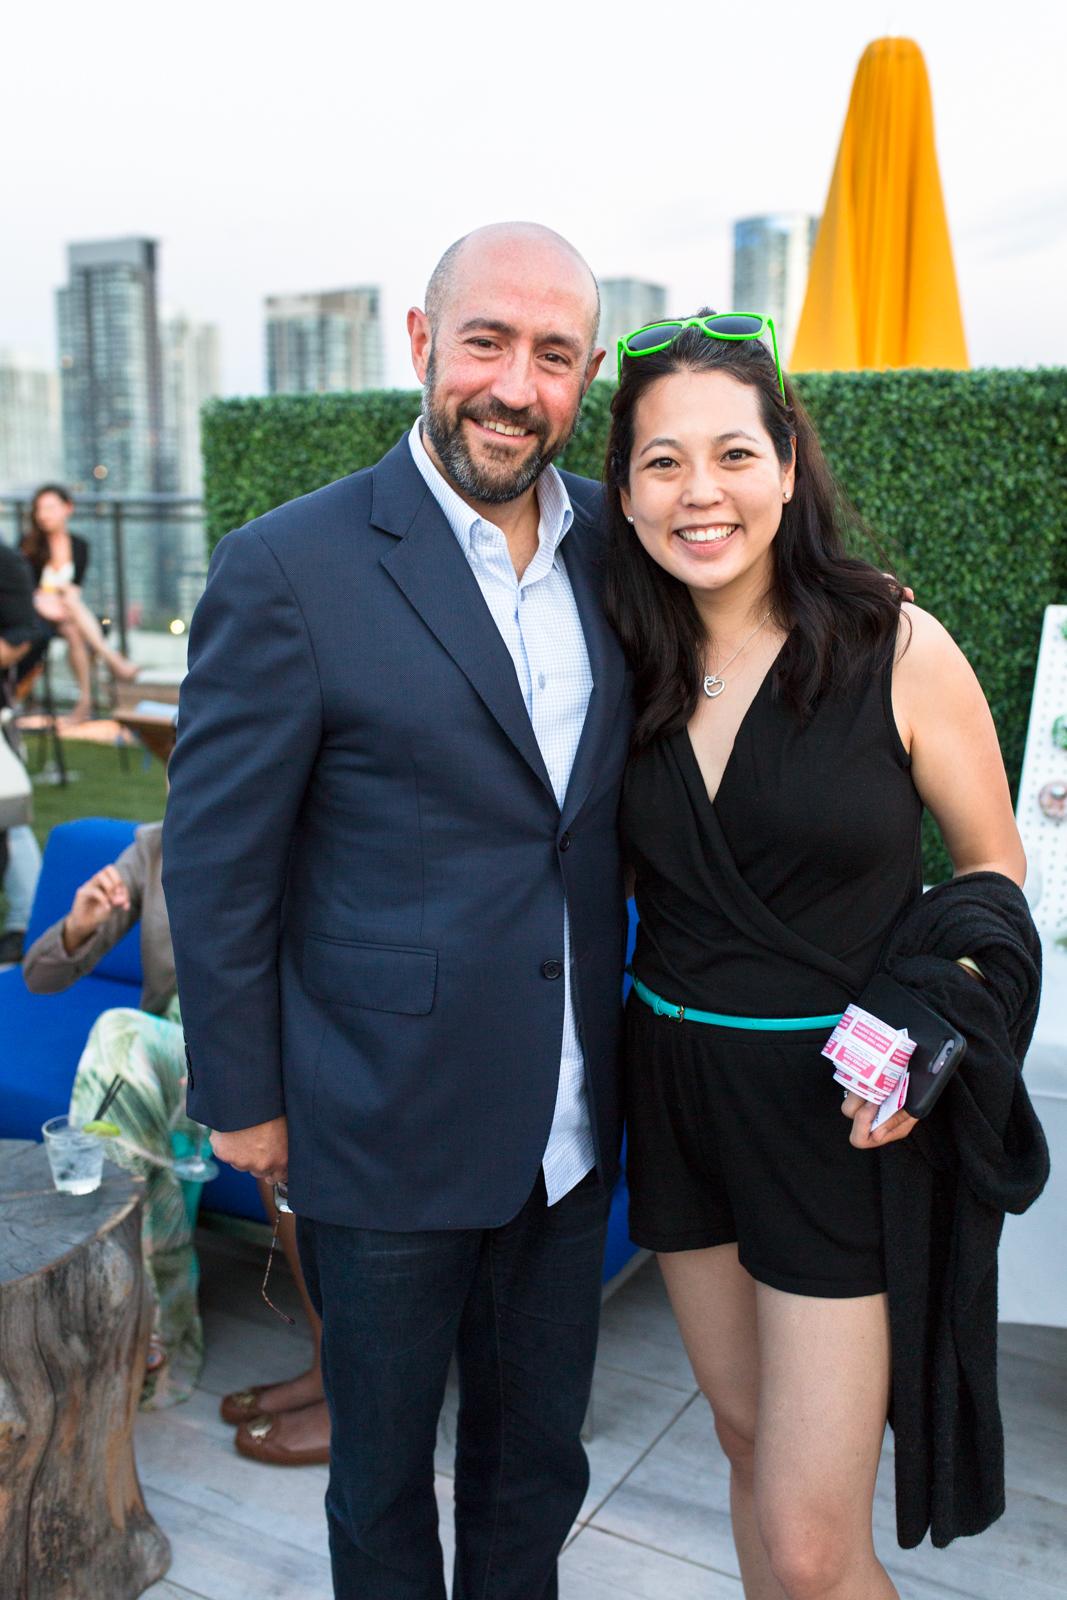 20170820 Jay Rosenzweig & Esther Park, Head of Marketing and Community, Drop Loyalty Inc.jpg